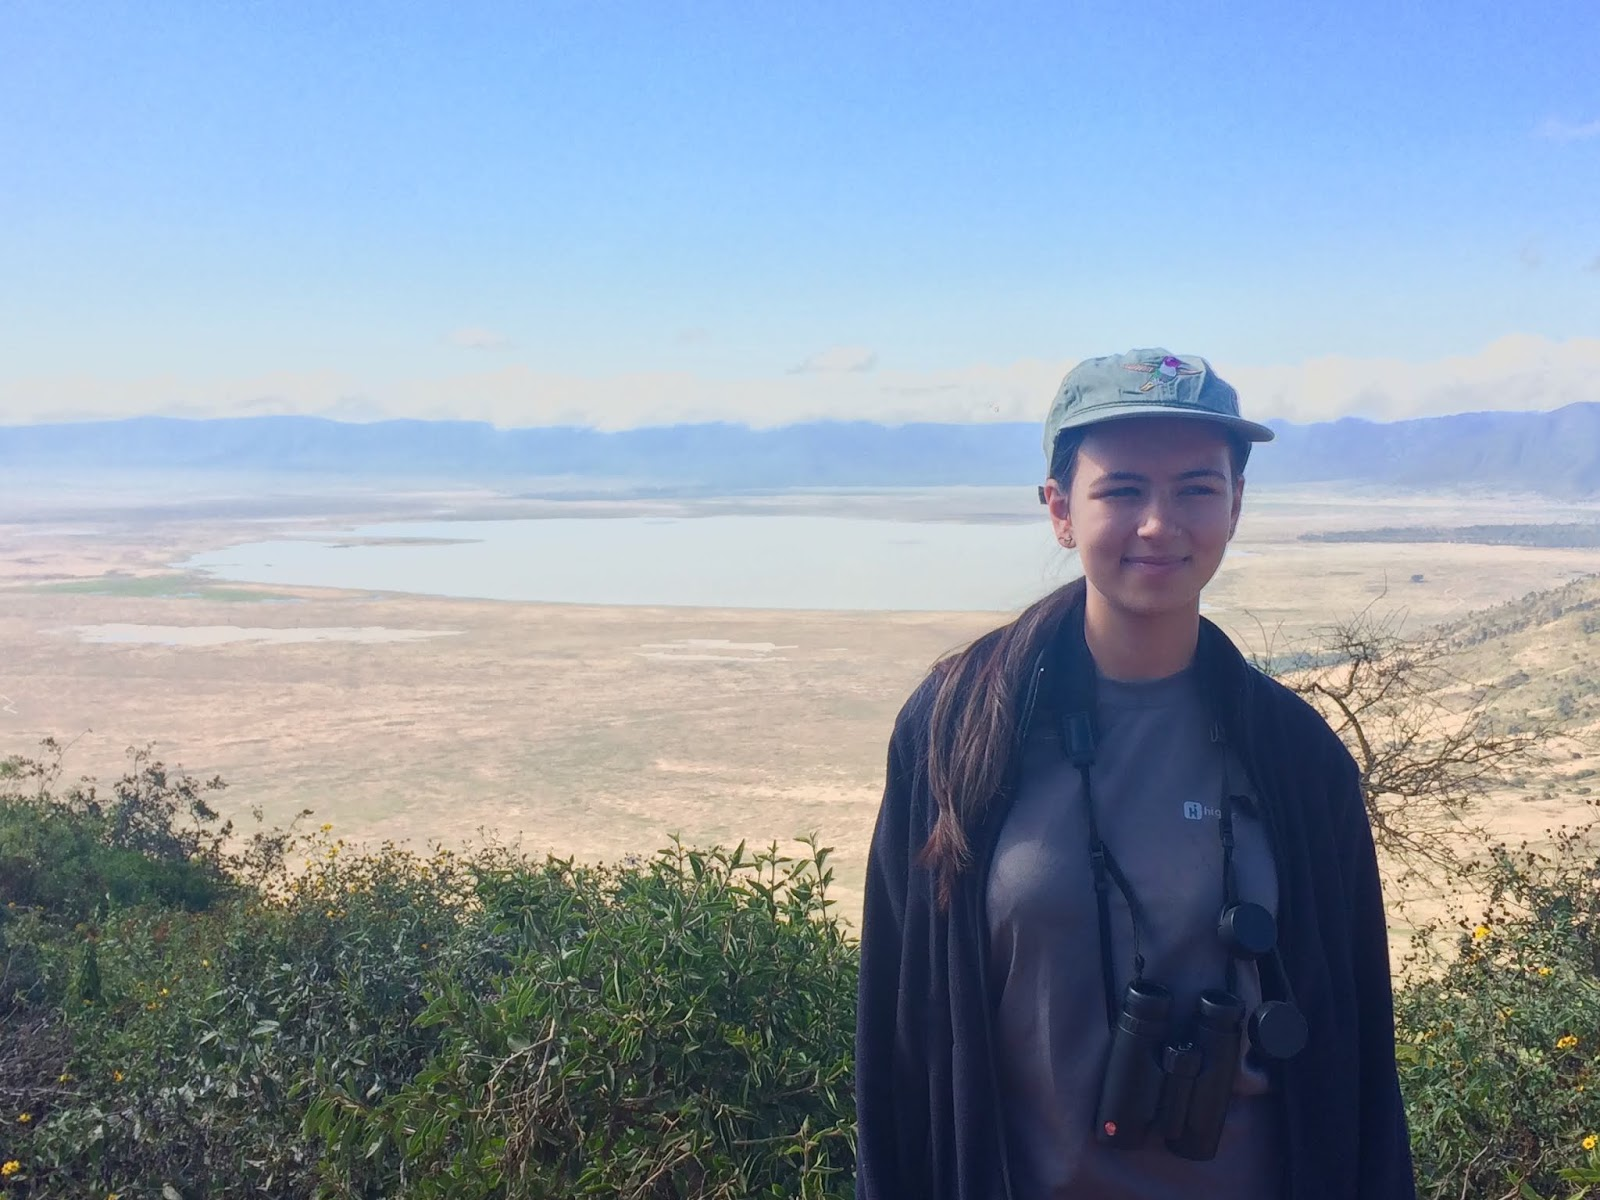 Birding in Tanzania Blog – Day 4 – 7